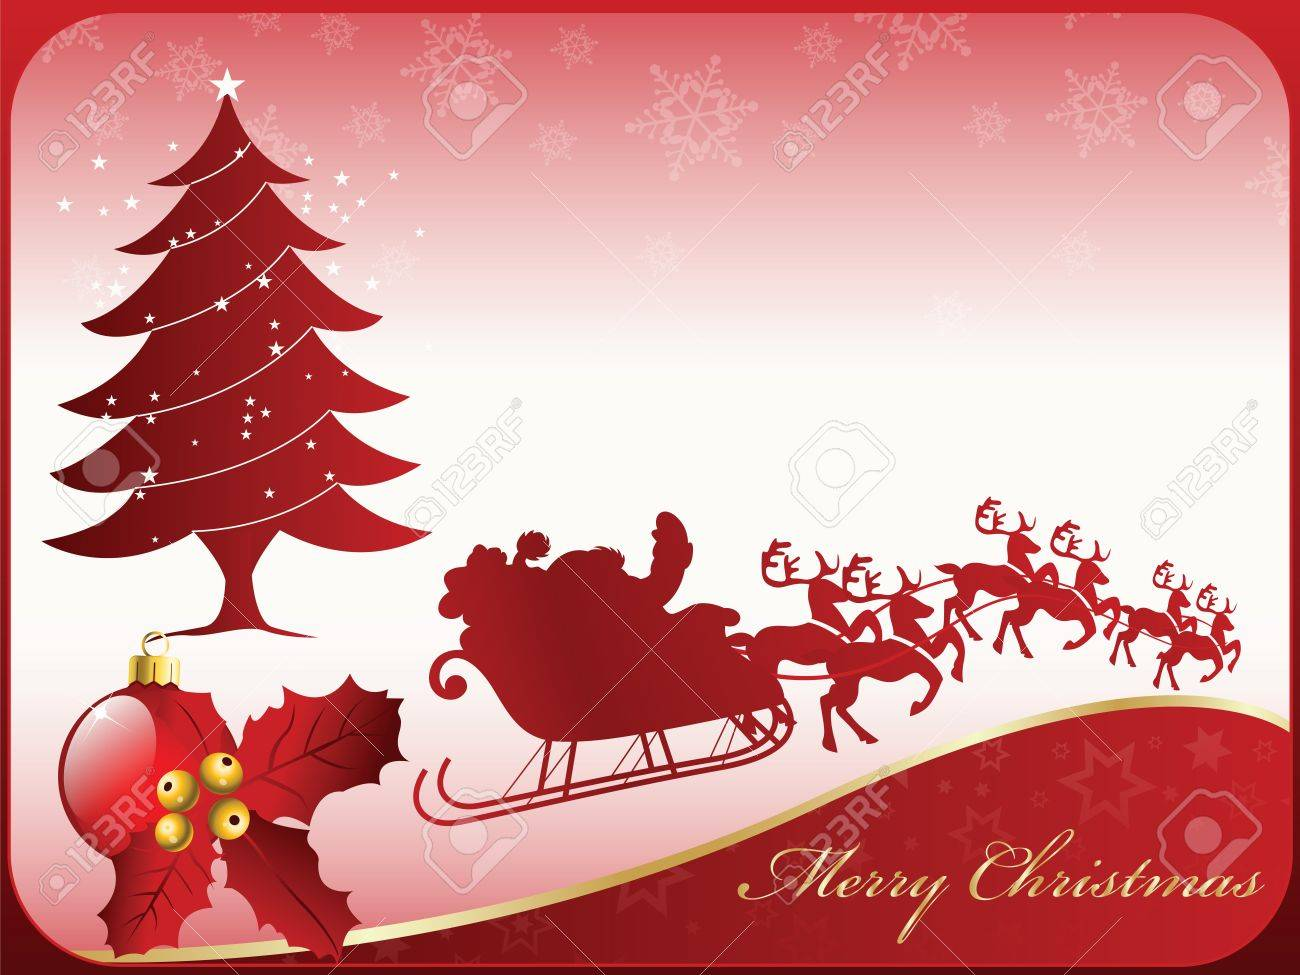 A nice seasonal merry christmas card design with santa claus a nice seasonal merry christmas card design with santa claus and his reindeer a m4hsunfo